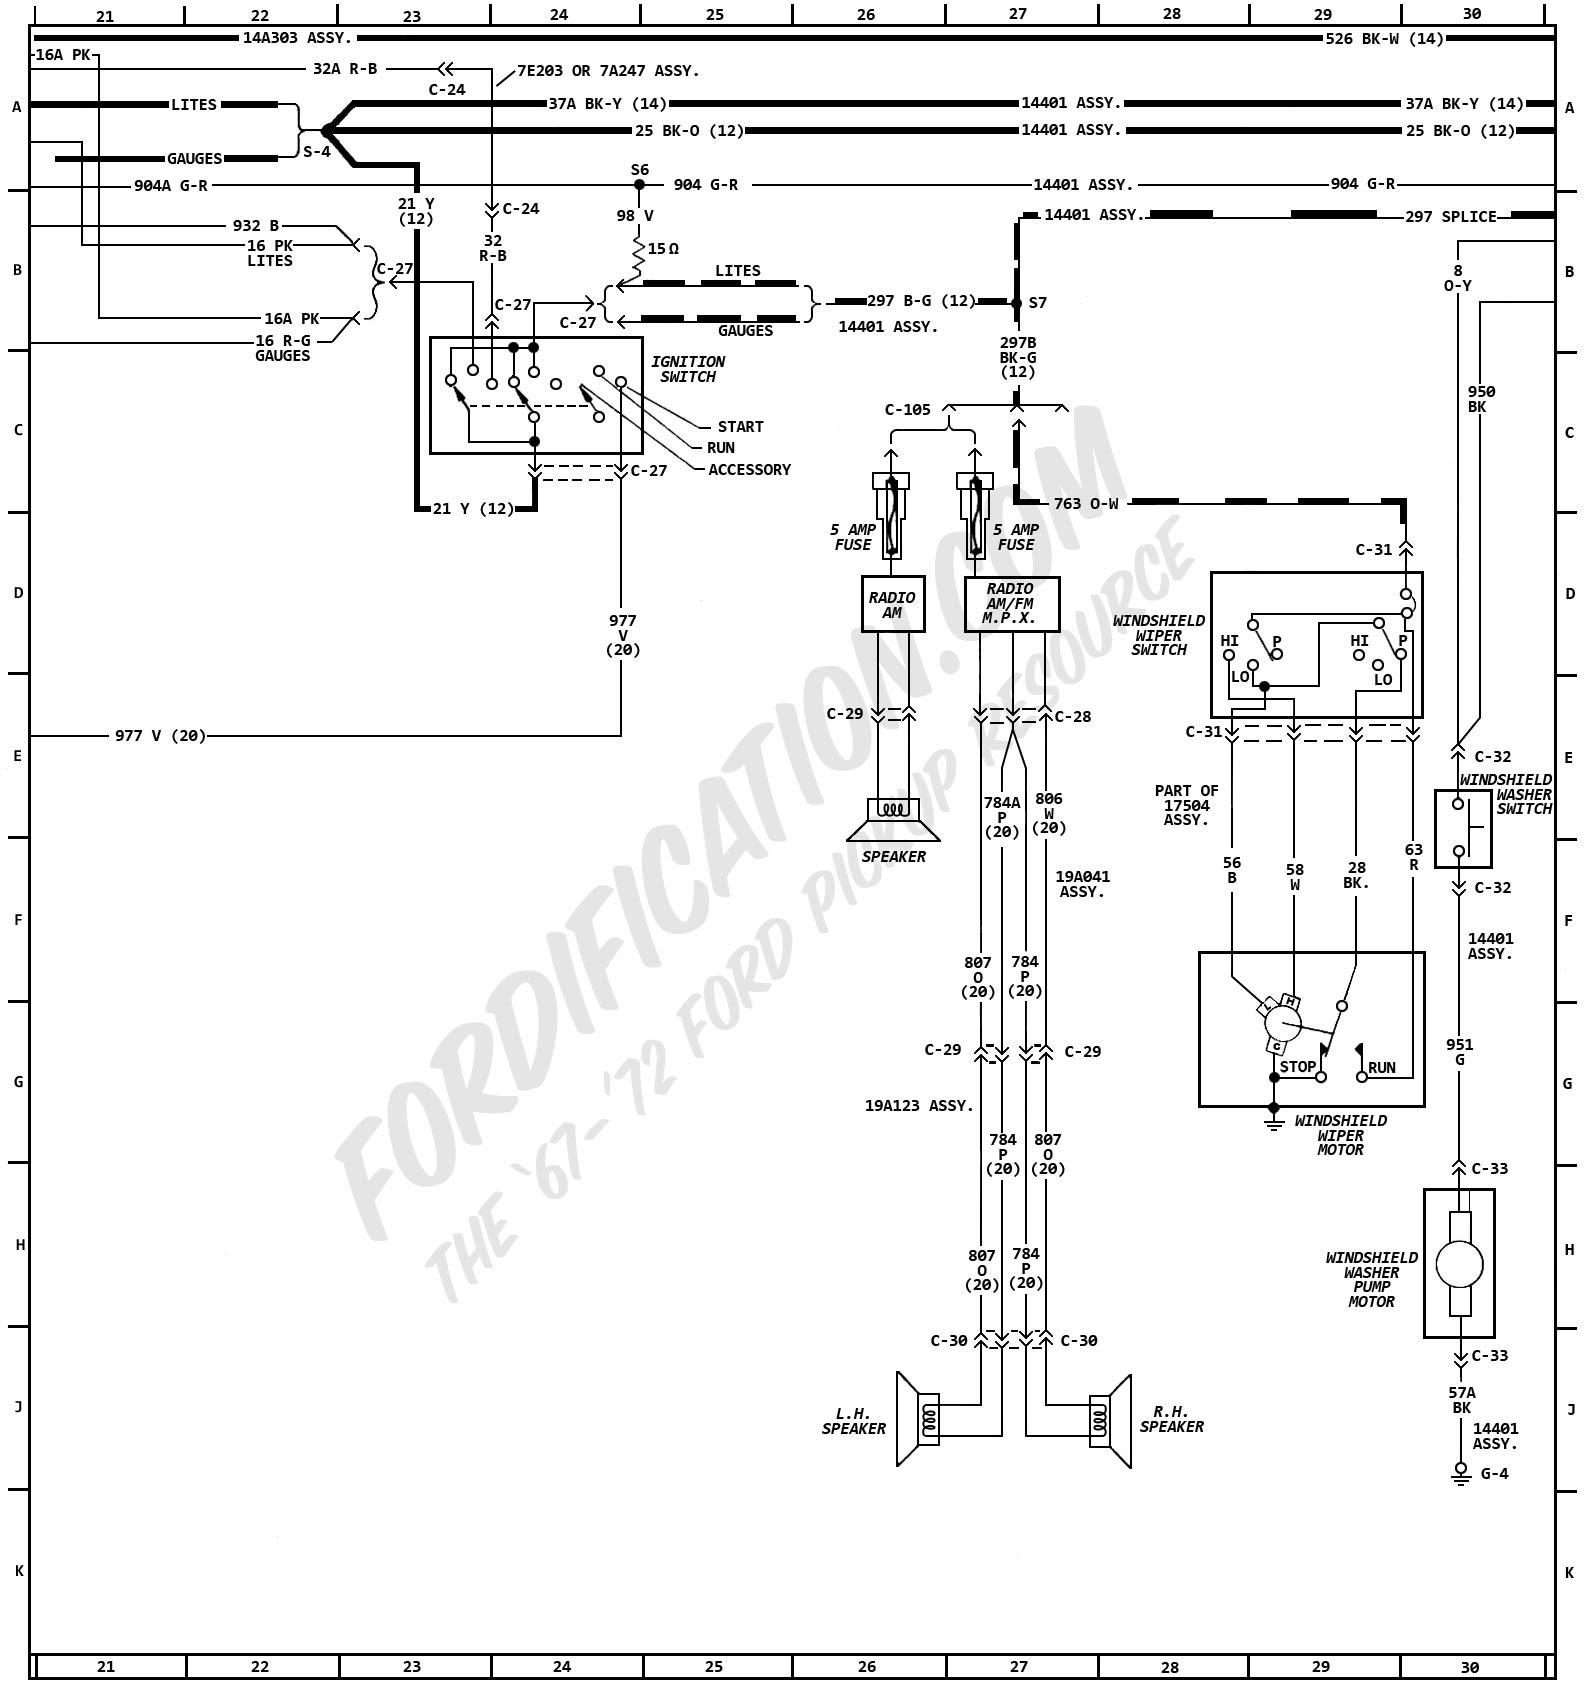 7347 1992 Ford Mustang Alternator Wiring Diagram Wiring Resources